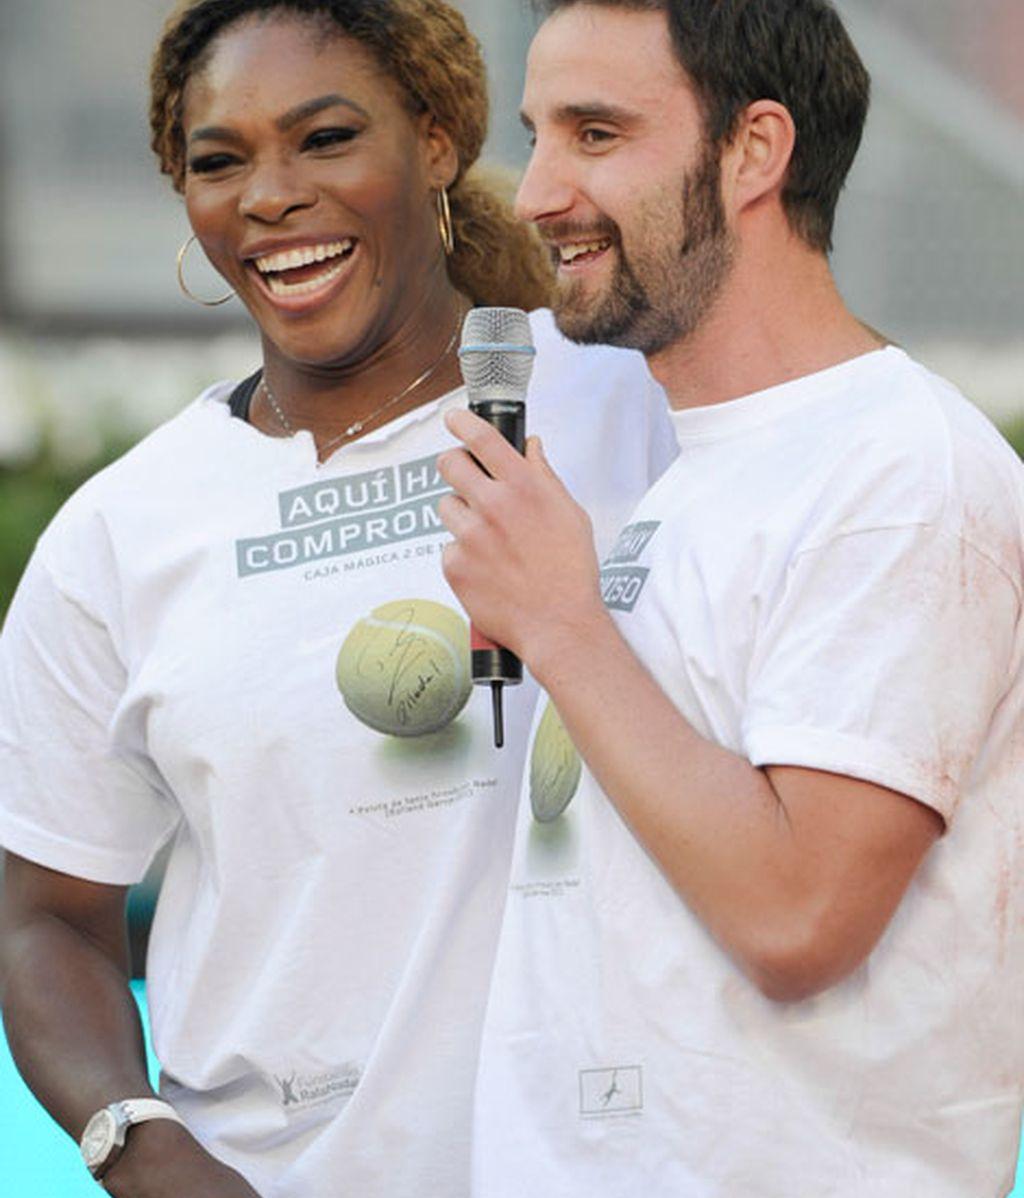 Las risas de Dani Rovira con Serena Williams